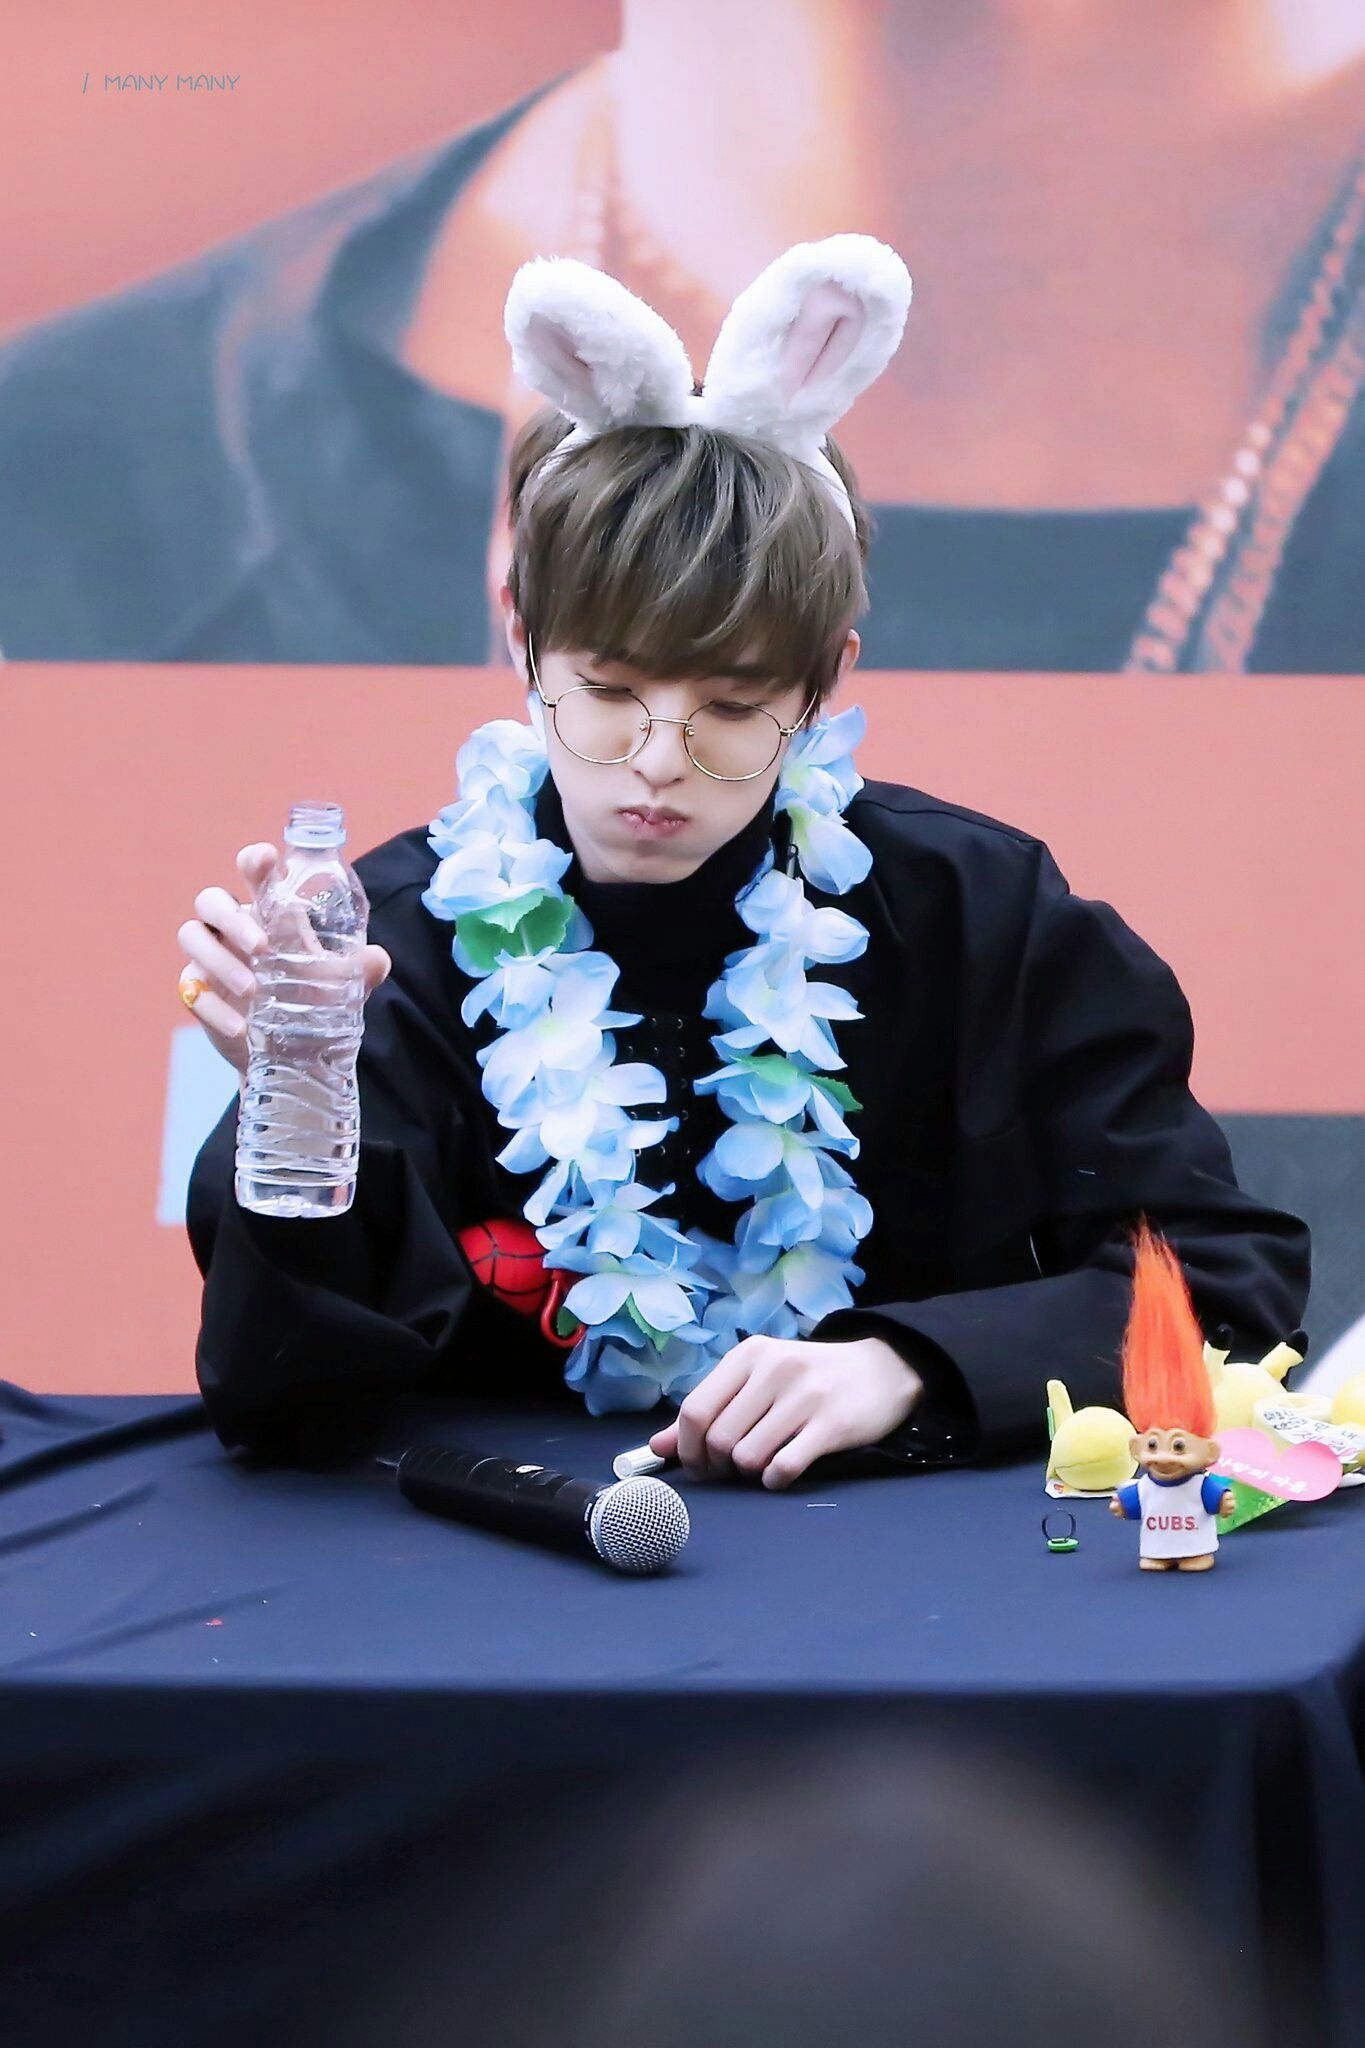 Stop stop it Jae, you bias wrecker